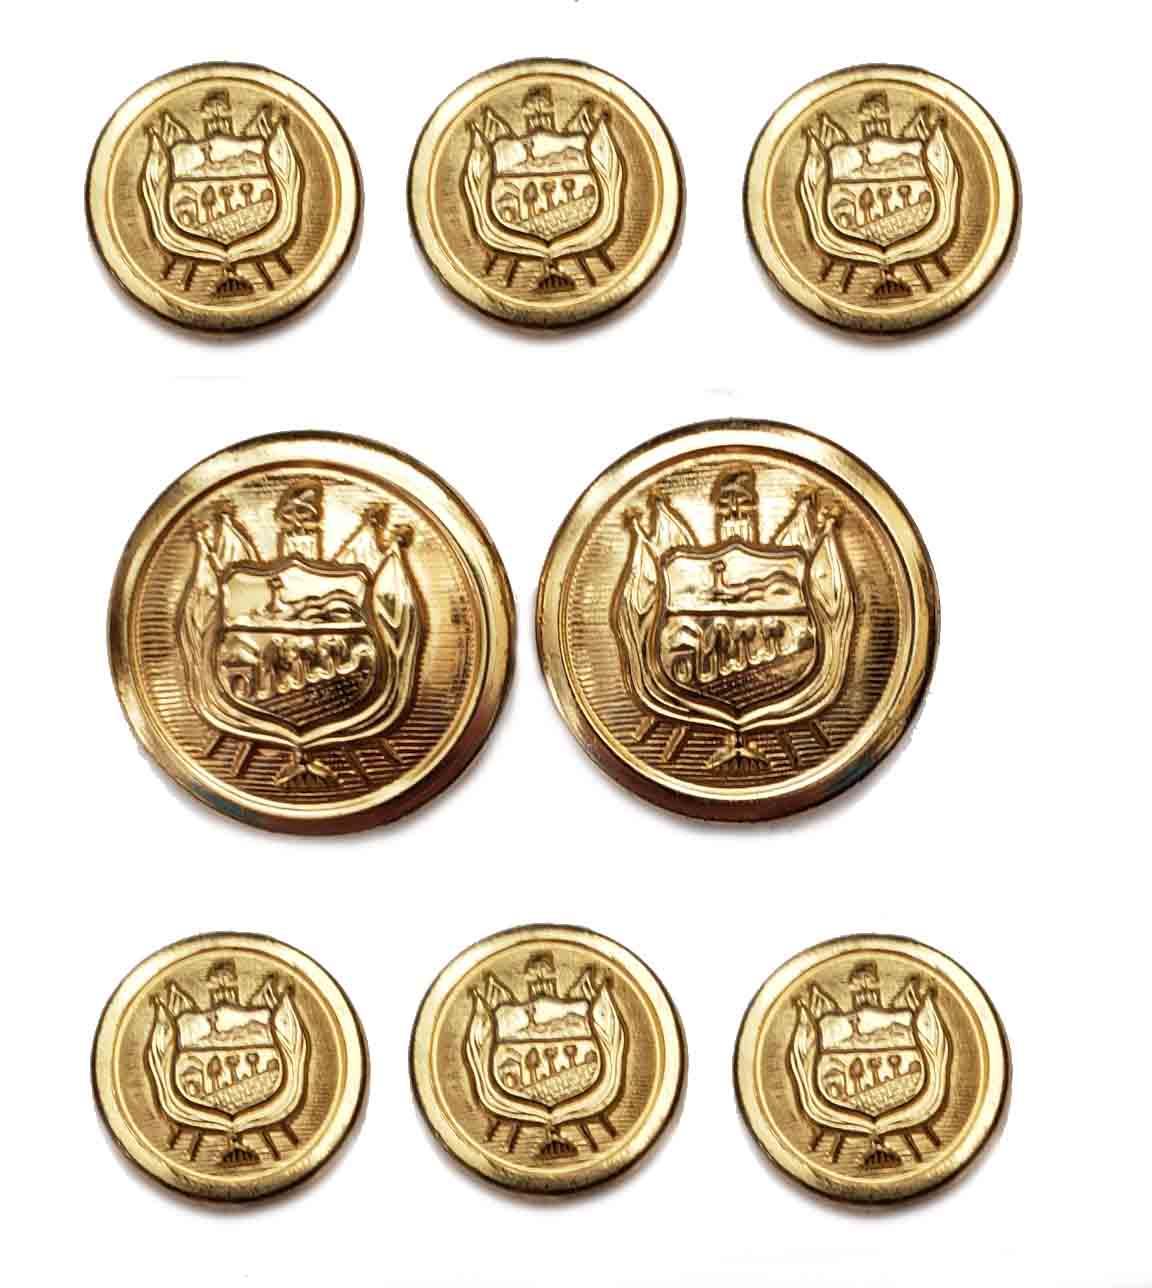 Vintage Stanley Blacker Blazer Buttons Set Gold Brass Shank Shield Pattern Men's 7/8